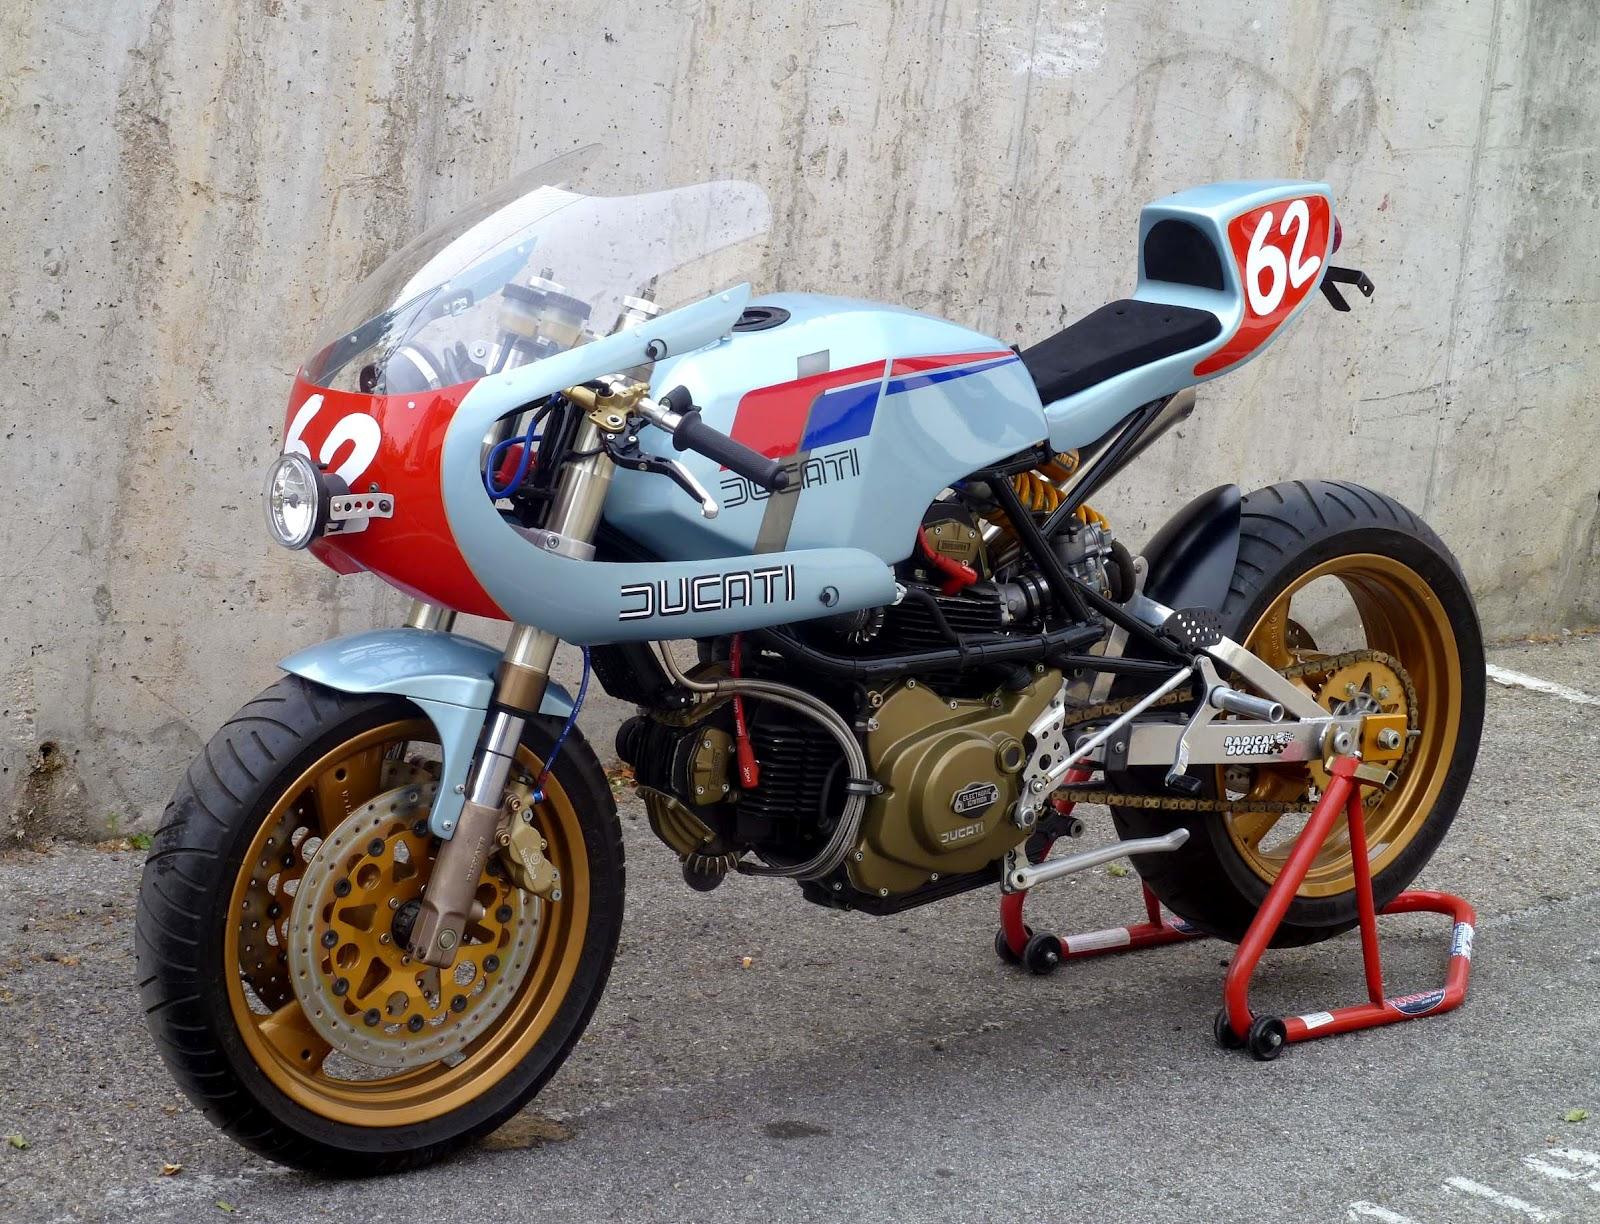 Enjoyable Radical Ducati S L 750 Pantahstica By Radical Ducati 2012 Wiring Database Gramgelartorg